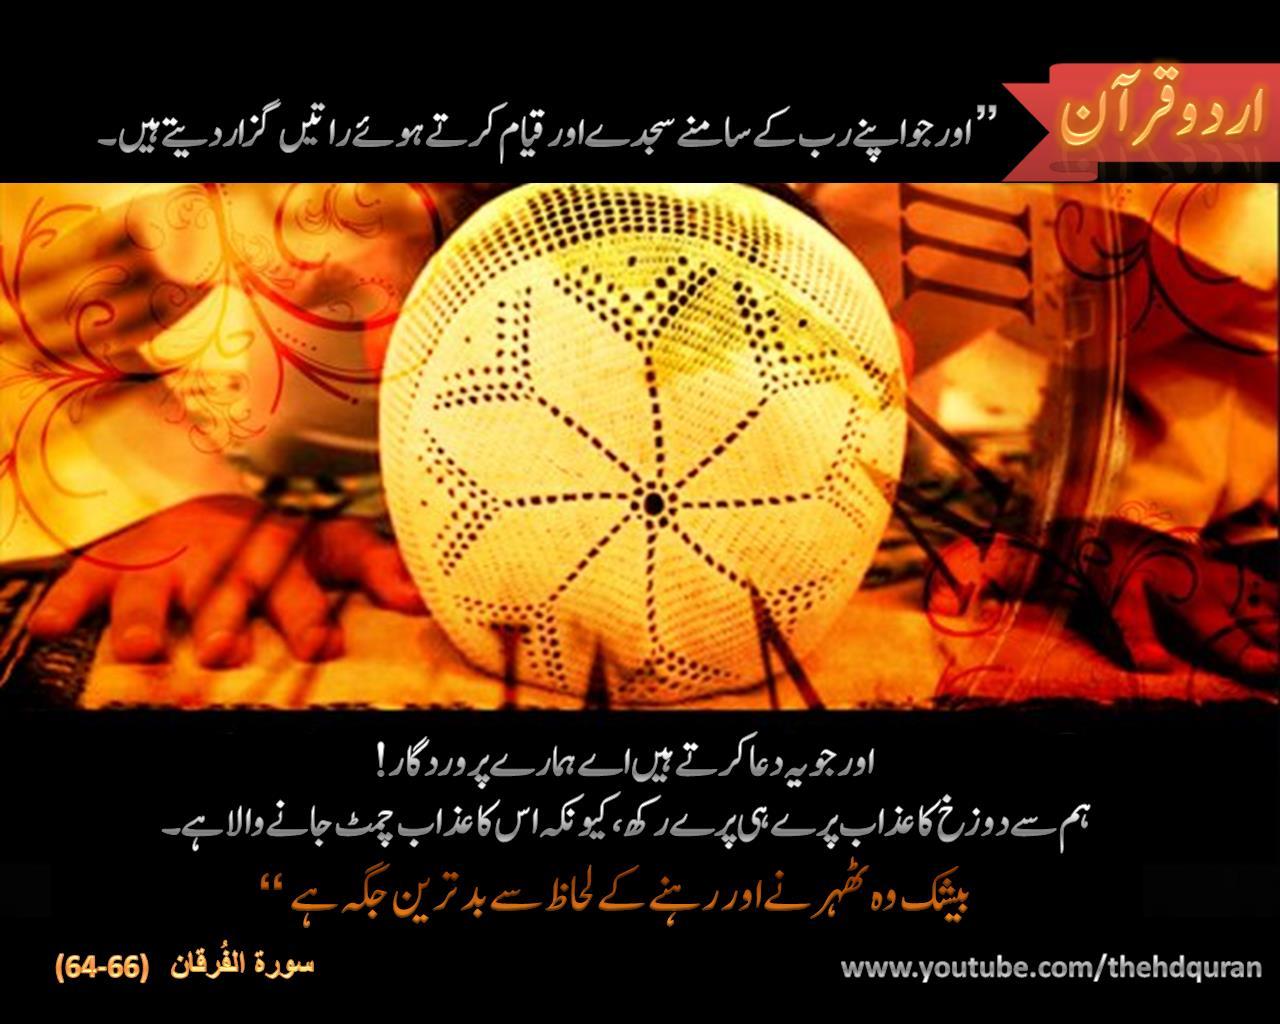 The HD Urdu Quran And Learn Islam 11 Islamic Wallpapers Learn